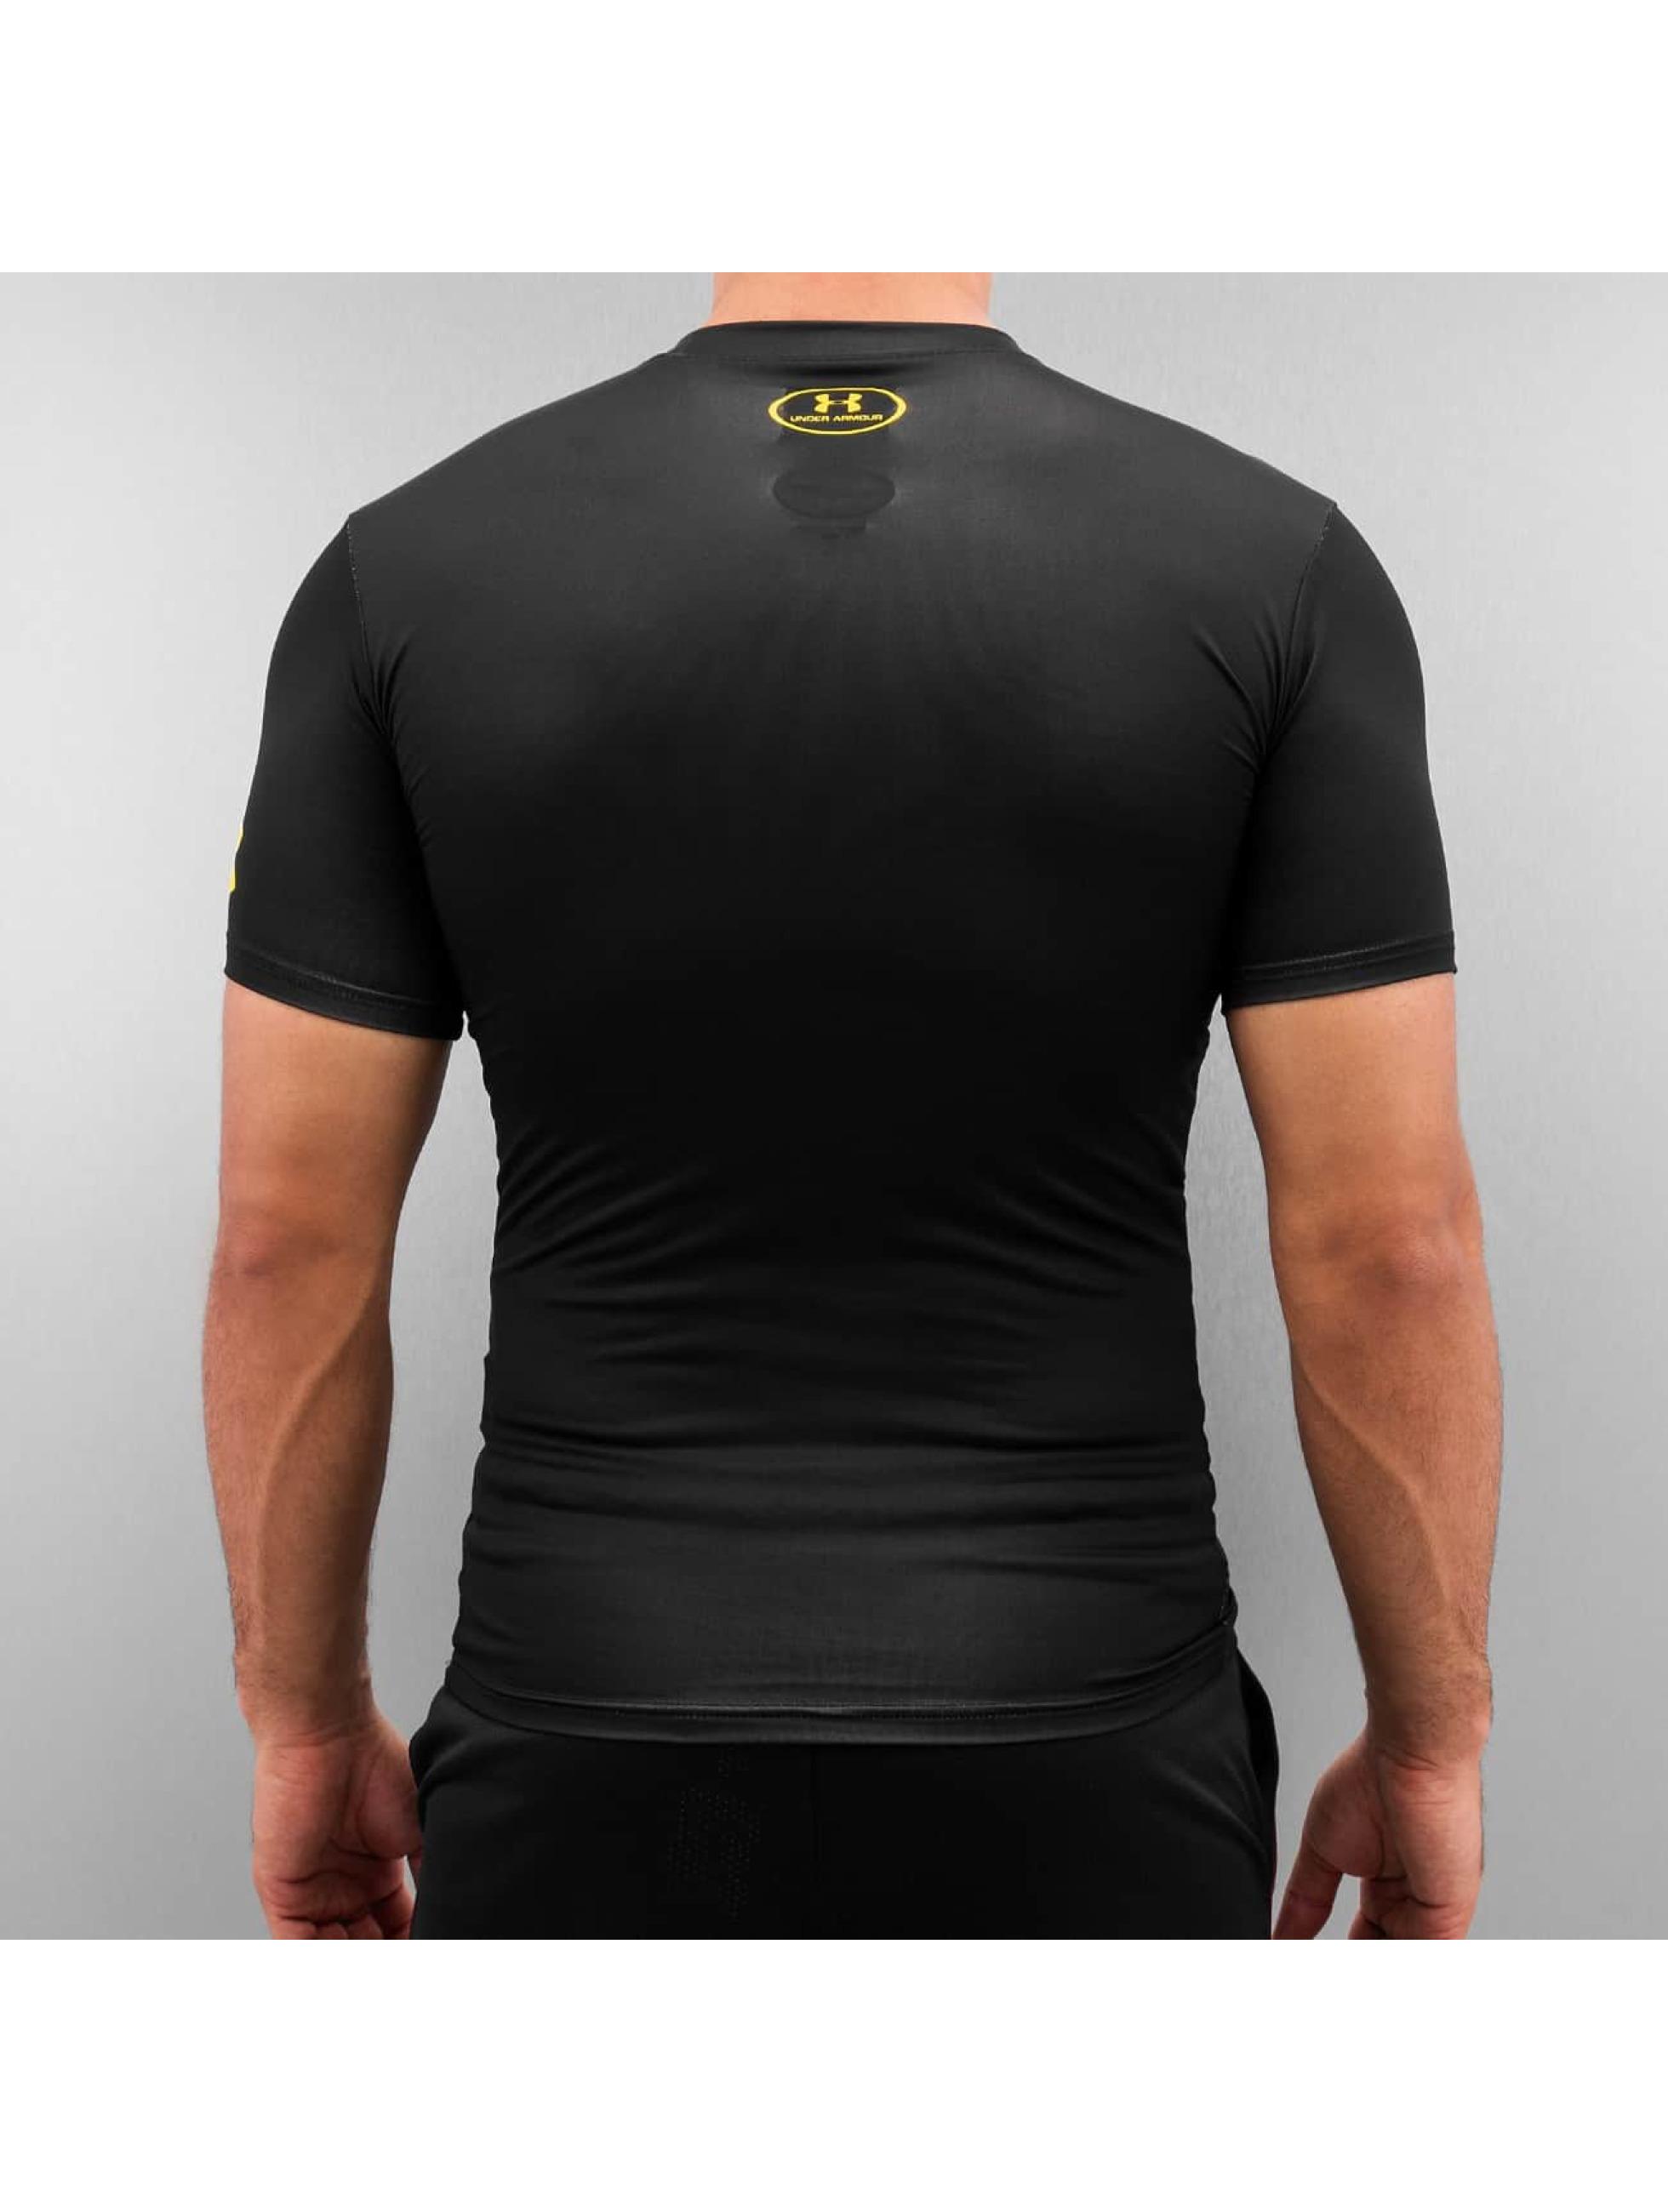 Under Armour T-shirt Alter Ego Batman Compression svart